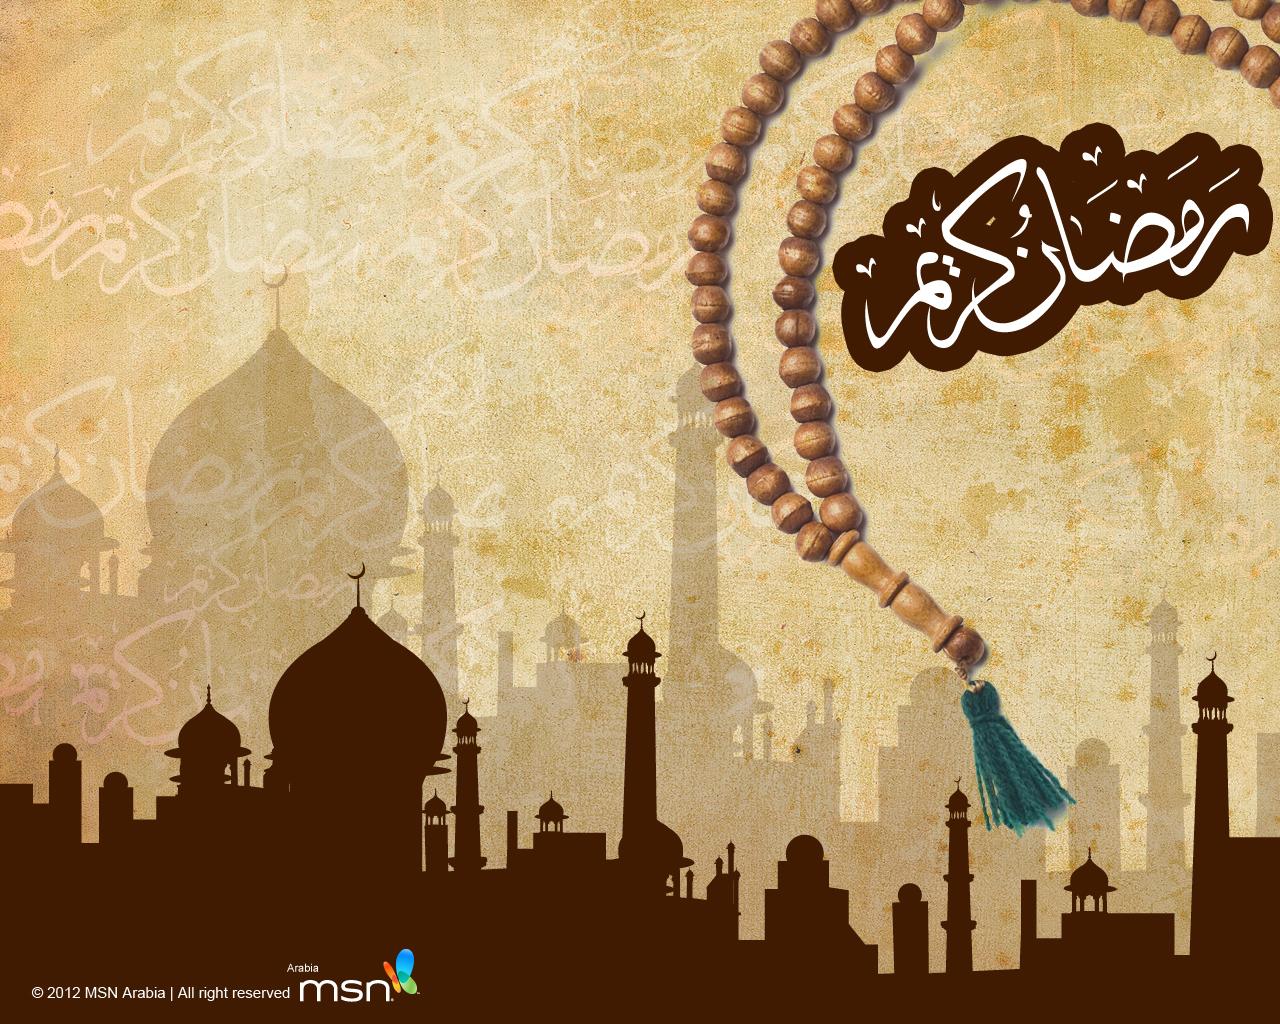 Islamic Girl Wallpaper Hd Top Ramadan Wallpaper Free Download Islam Hd Desktop